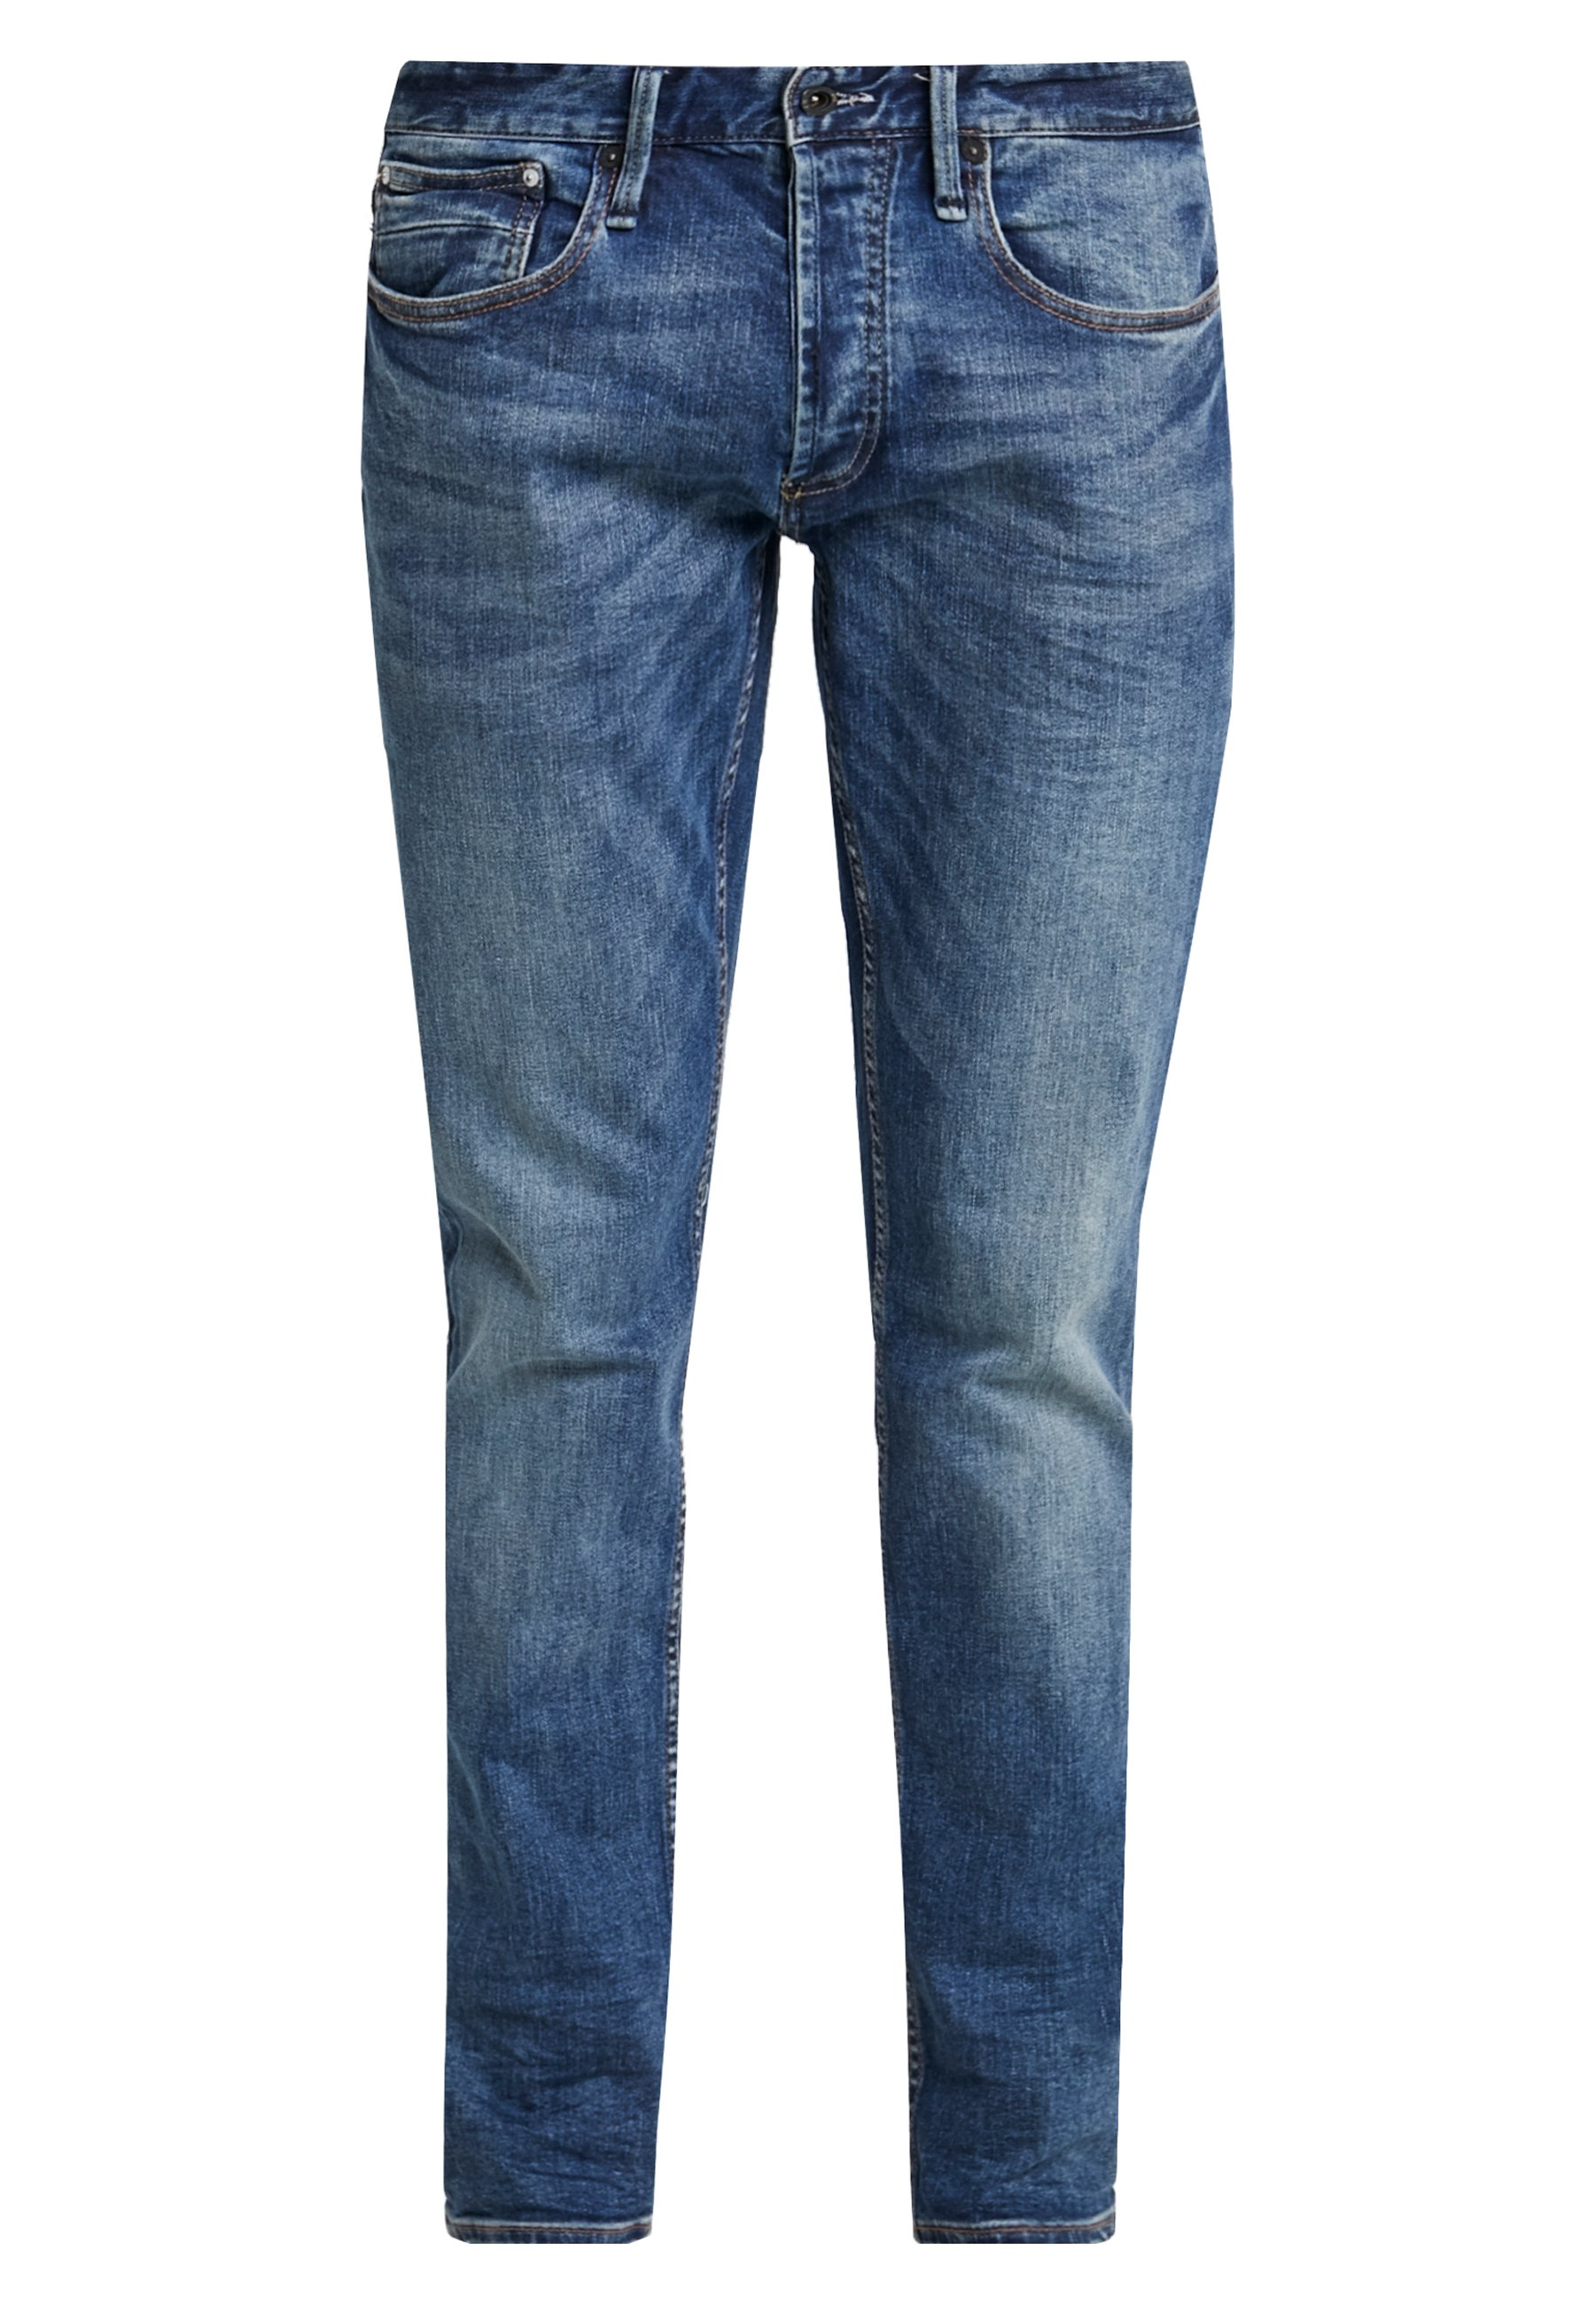 Denham Razor - Jeans Slim Fit Blue